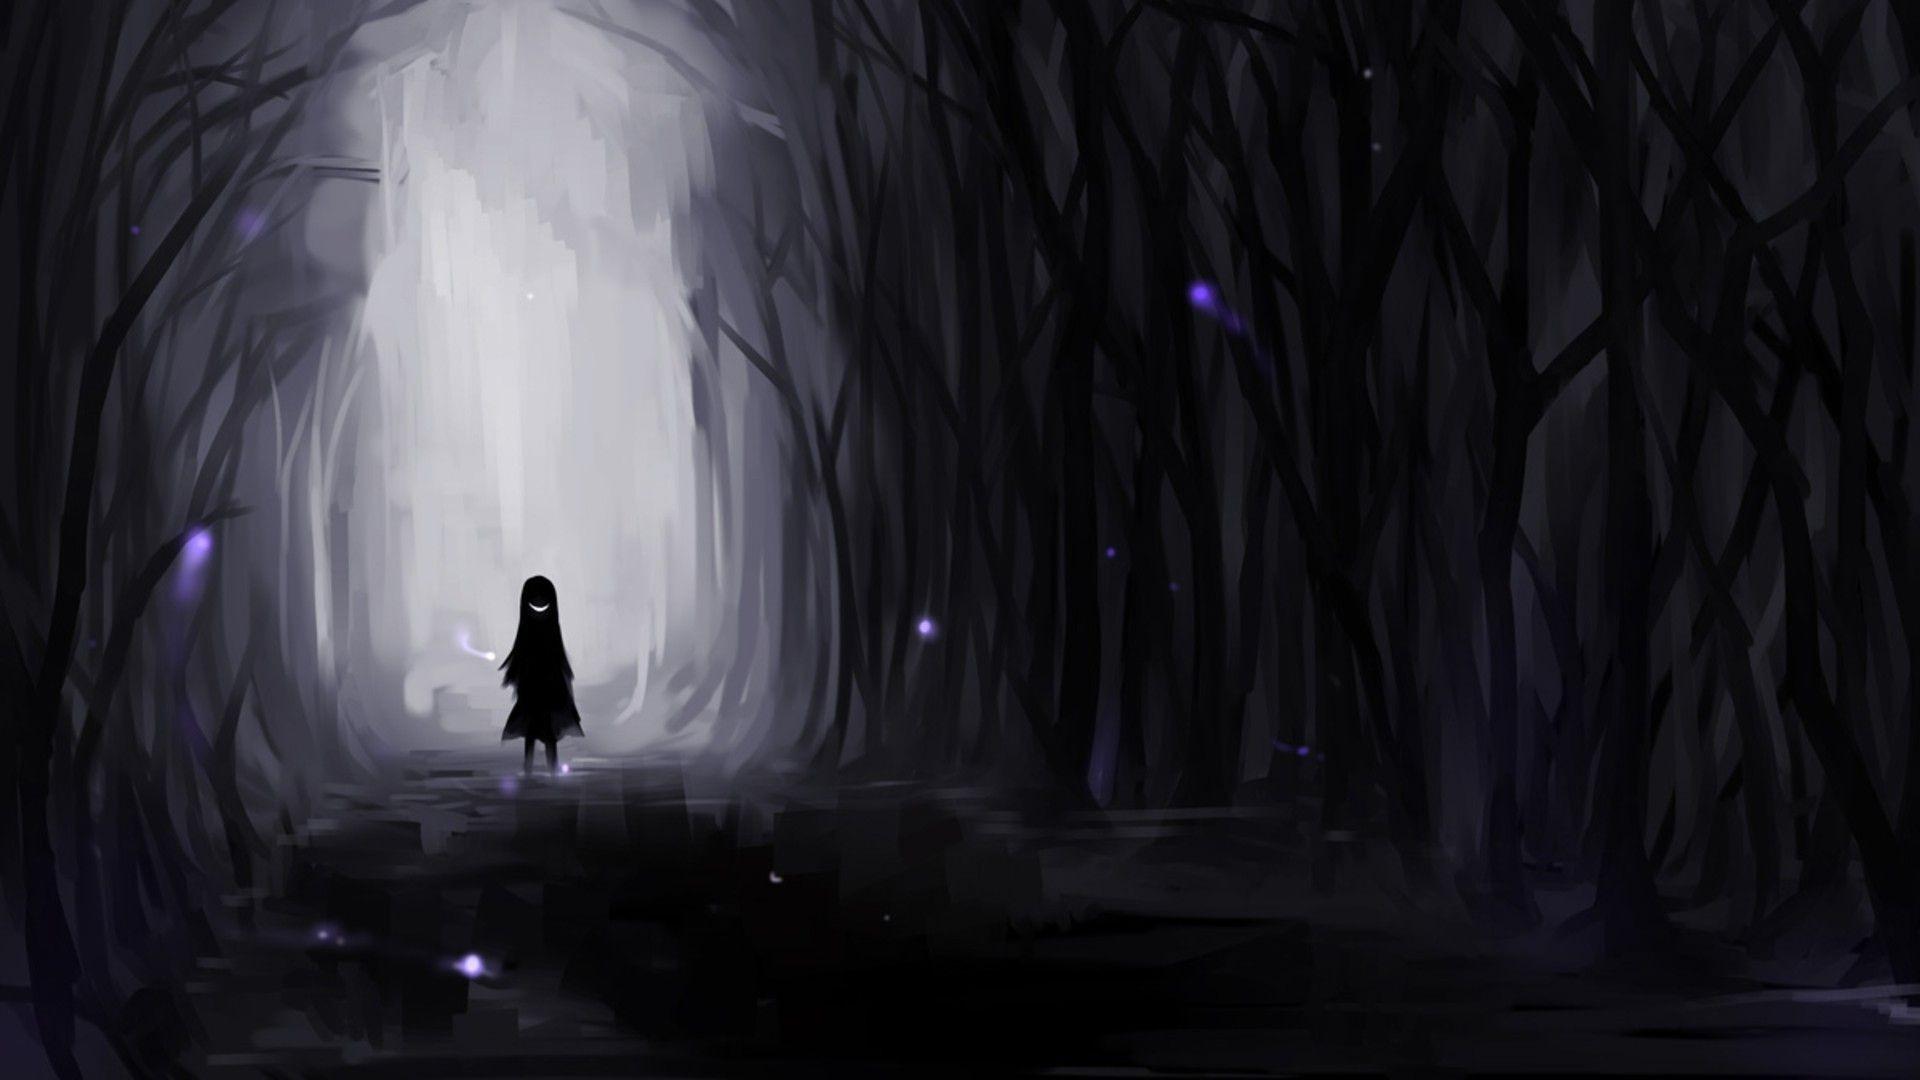 59 Dark Anime Wallpaper Hd